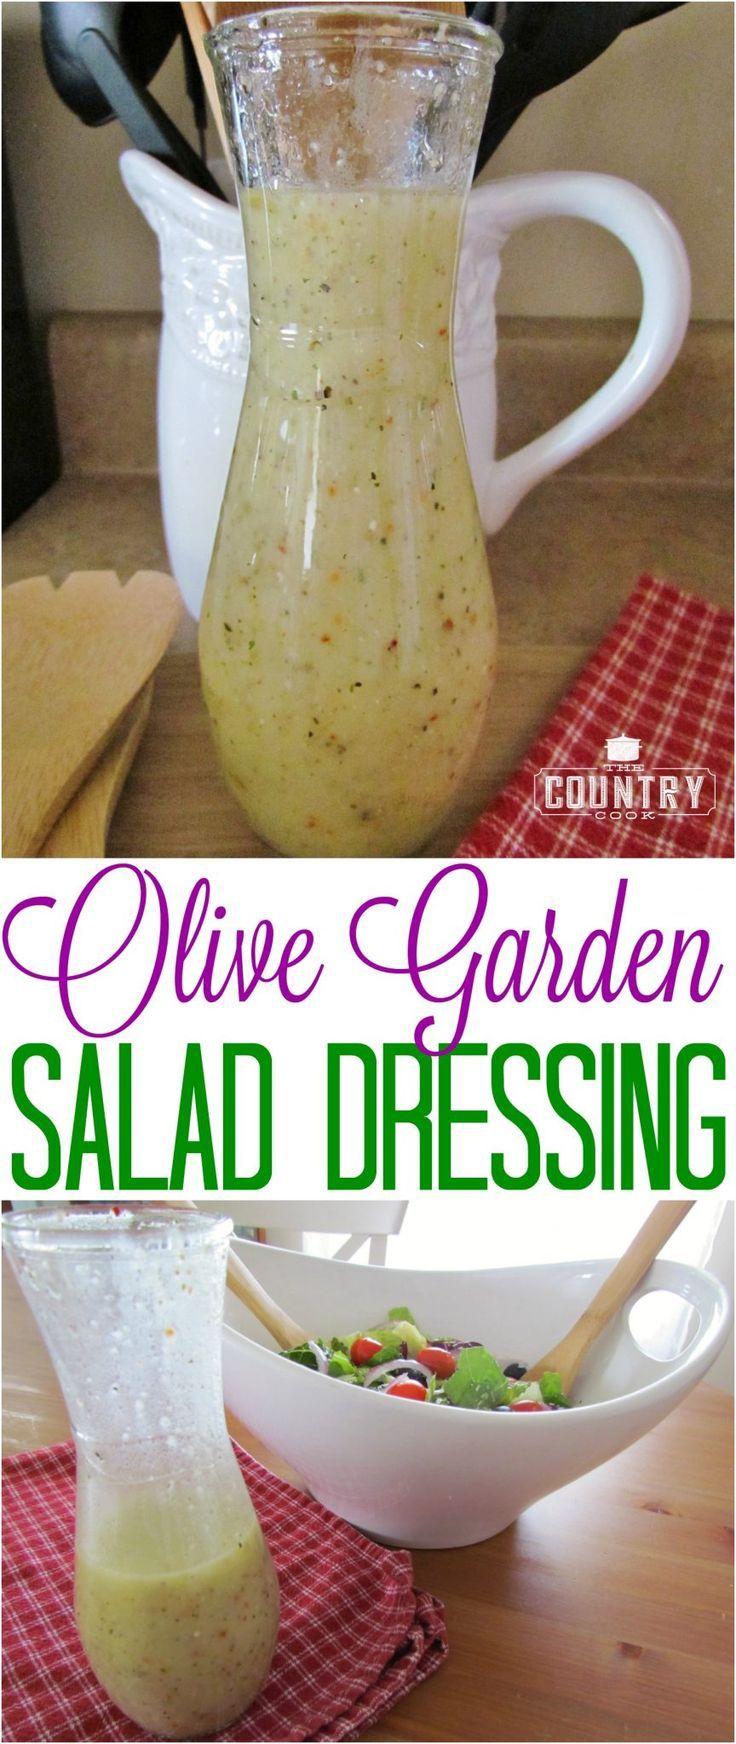 17 Best Ideas About Olive Garden Salad On Pinterest Olive Garden Italian Dressing Olive